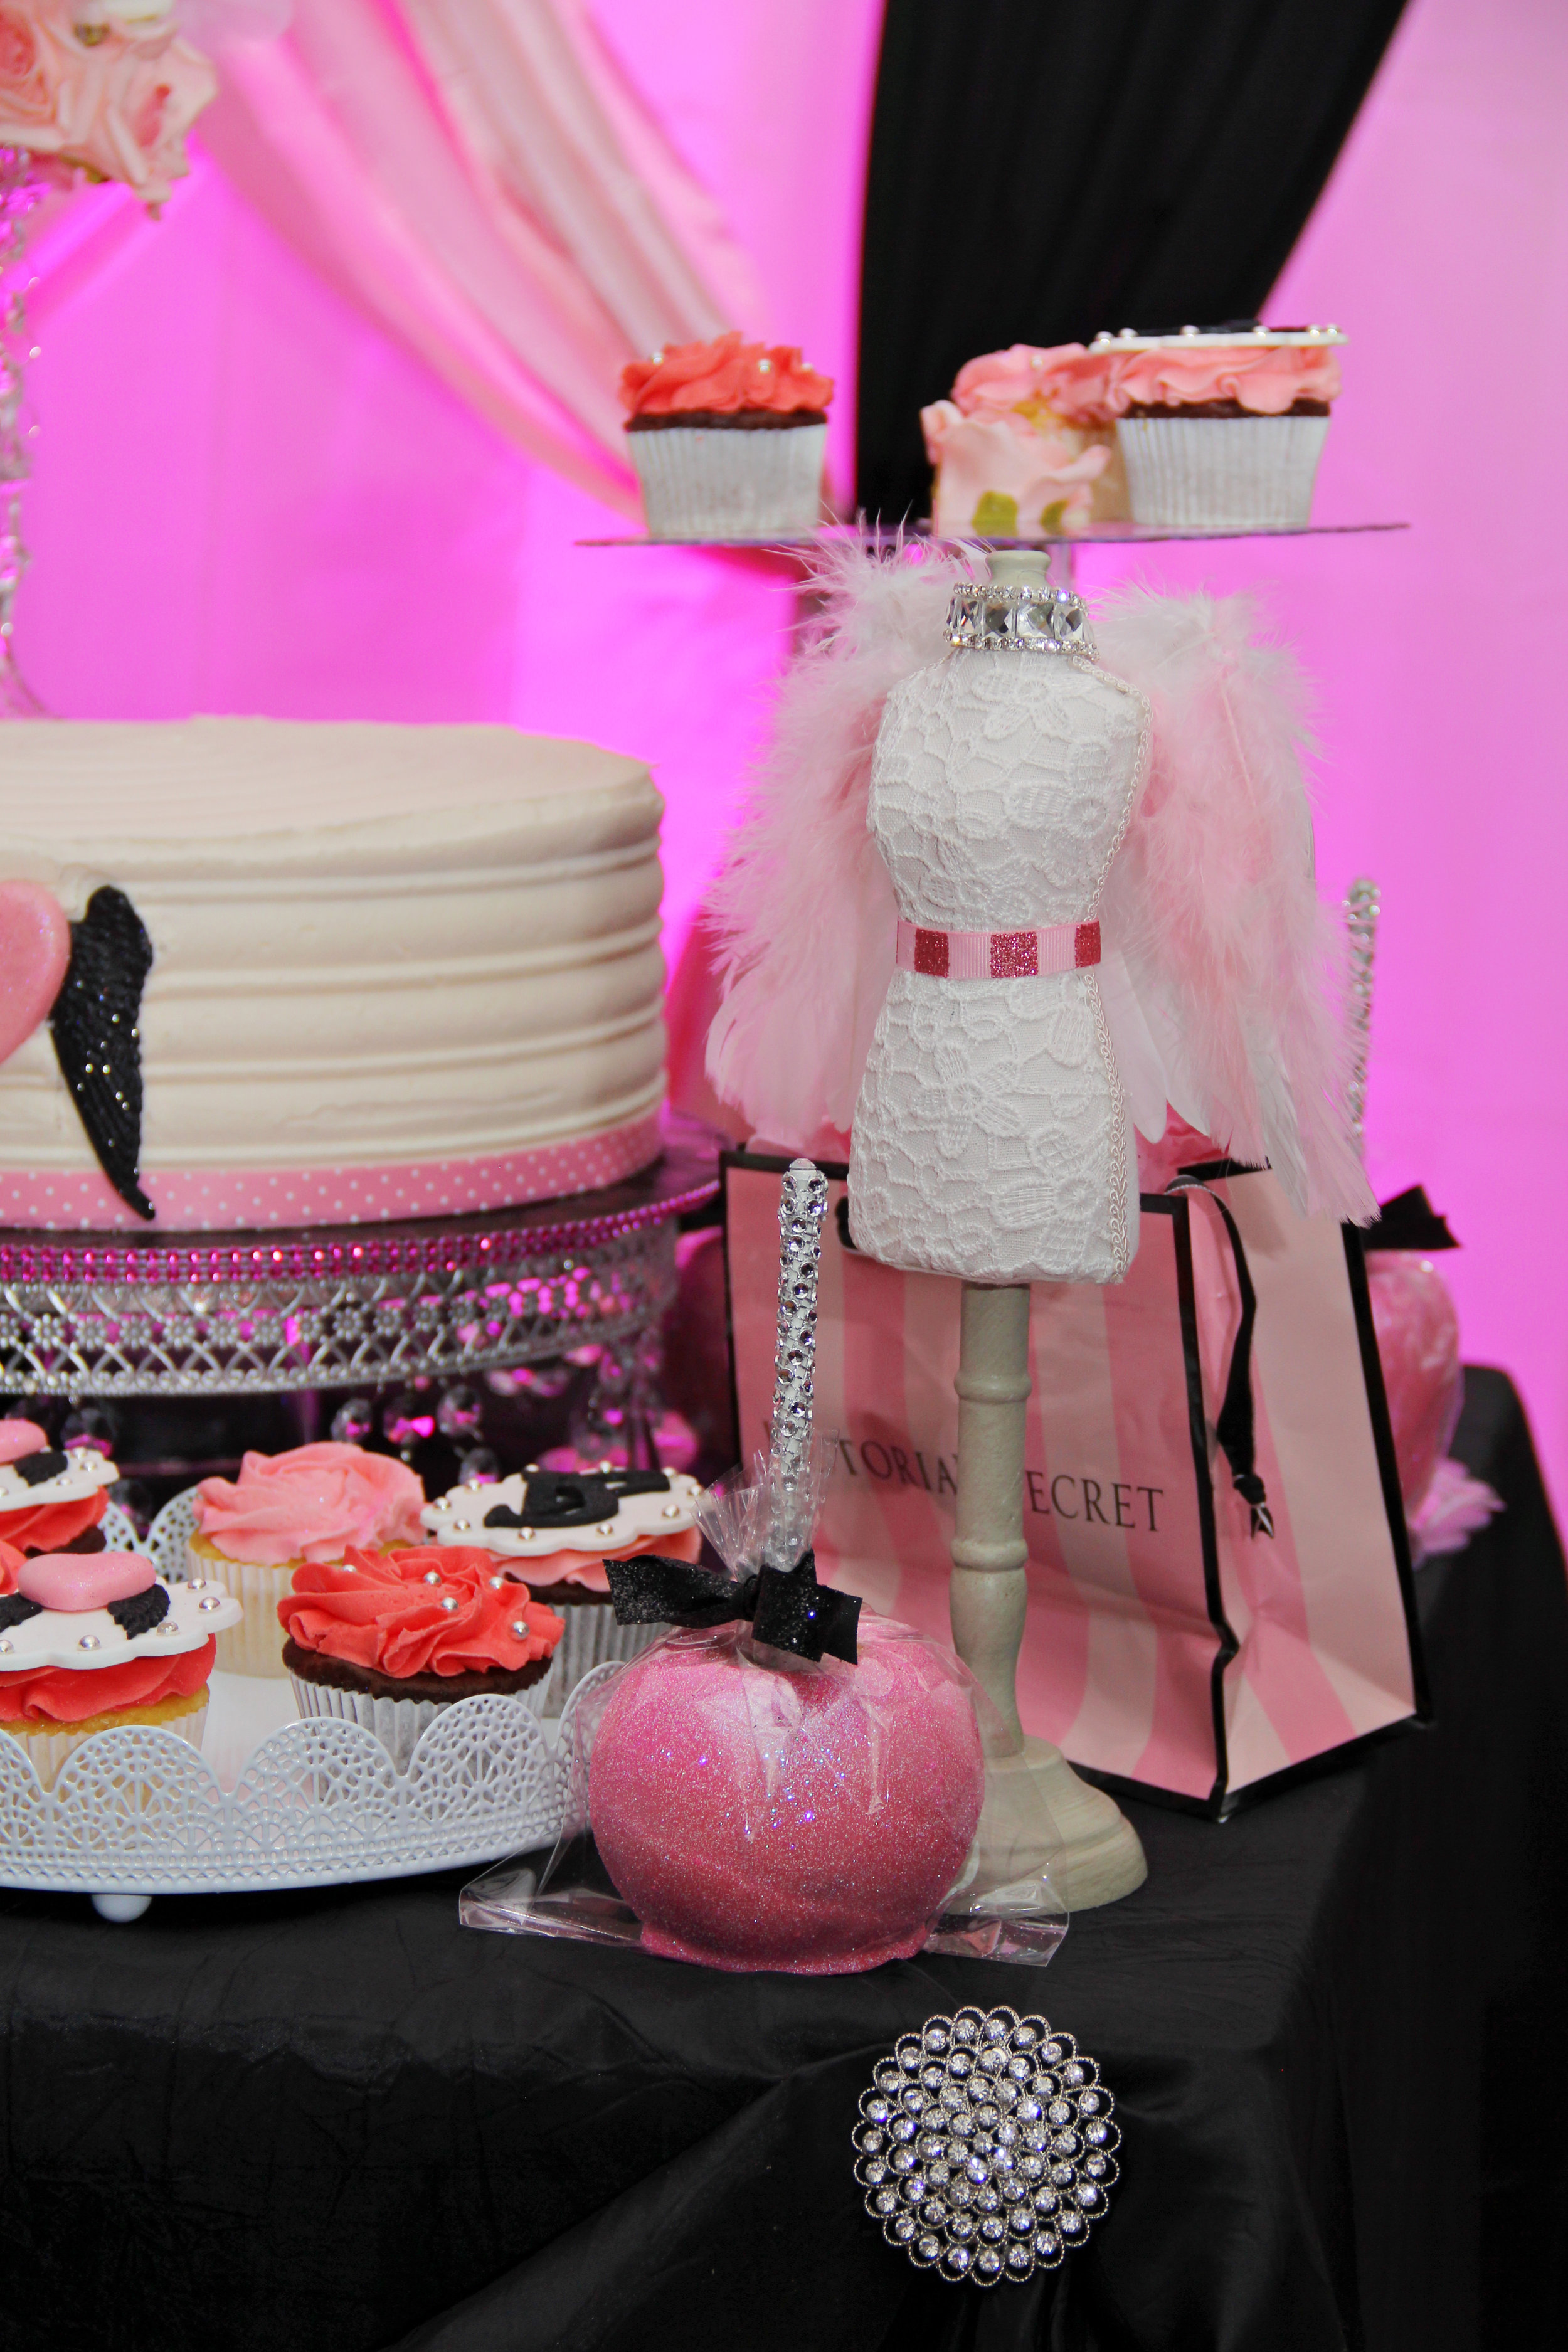 Scar-Vita-2017-Copyright-Photography-Sweet-Sixteen-Bash-Bronx-Victorias-Secret-Events-129.JPG